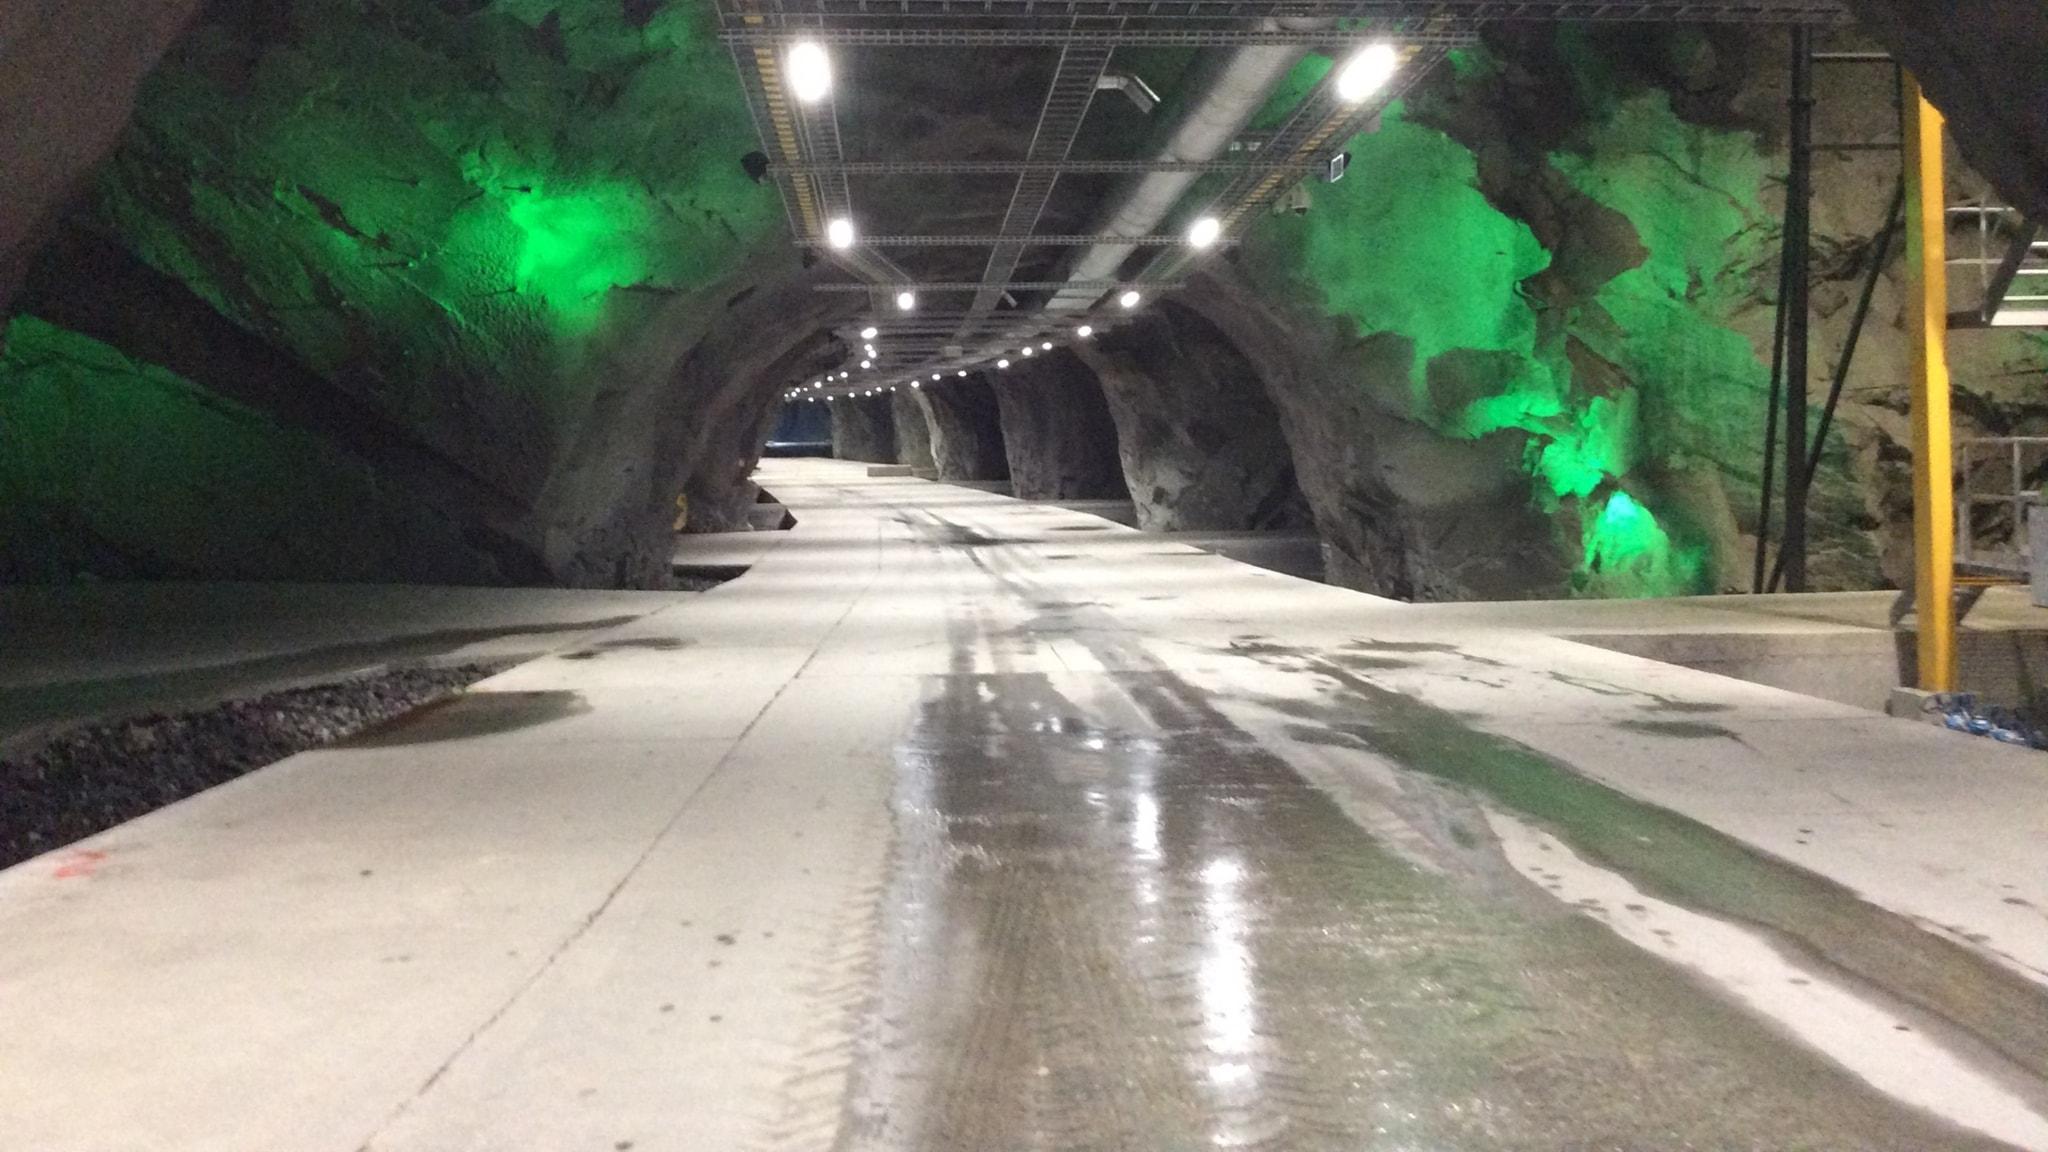 En tunnel med belysning